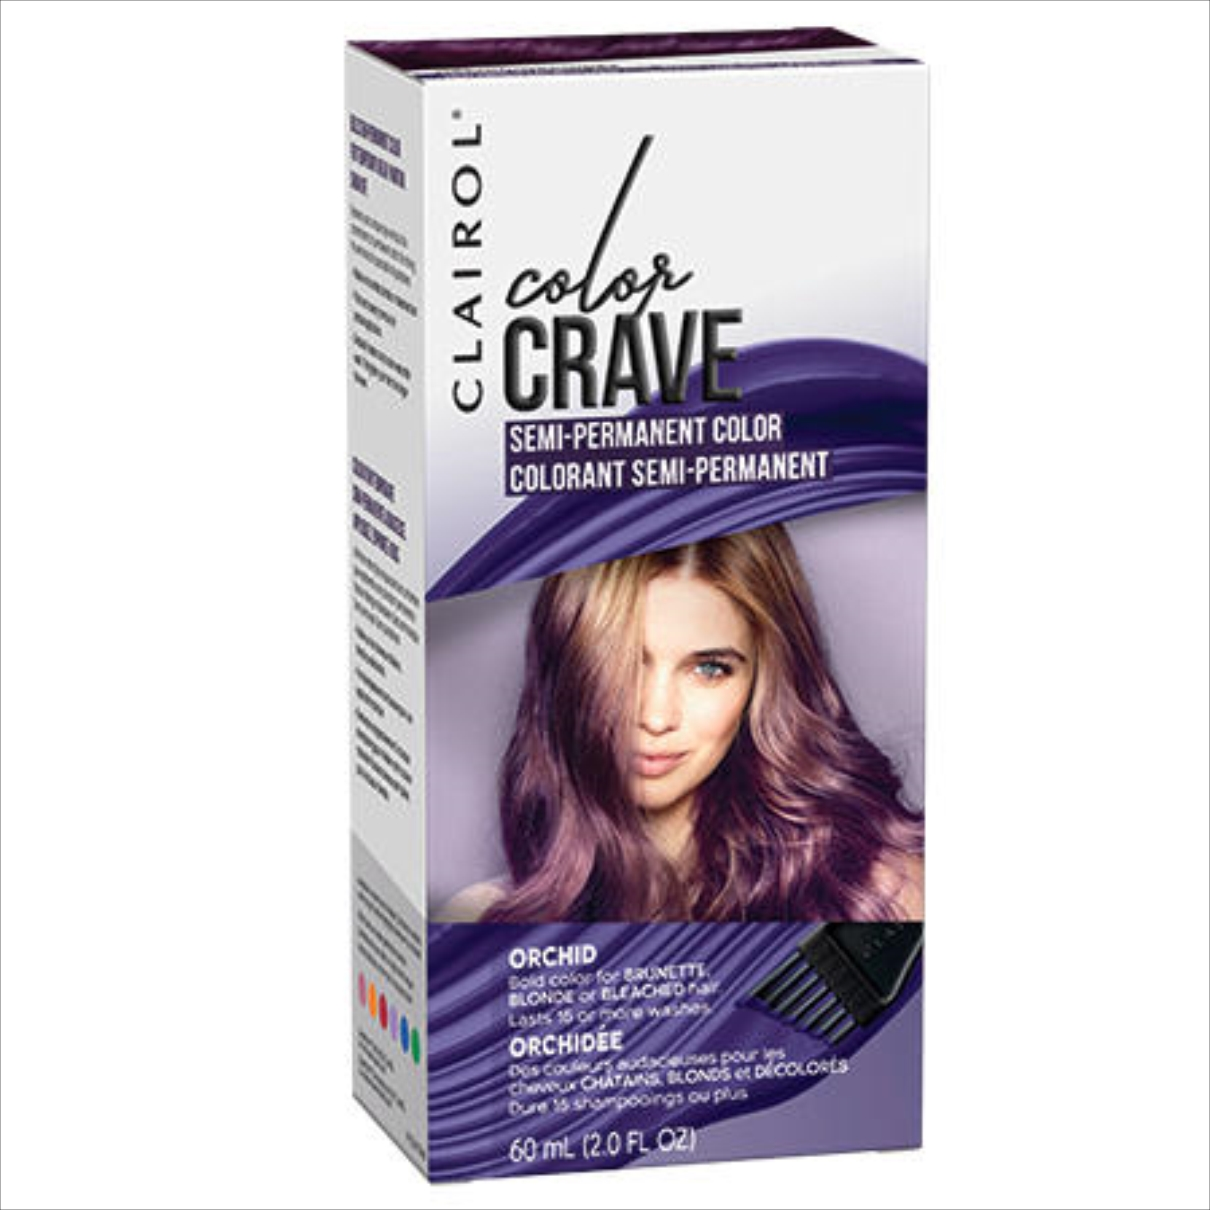 Semi-Permanent Hair Color | Clairol